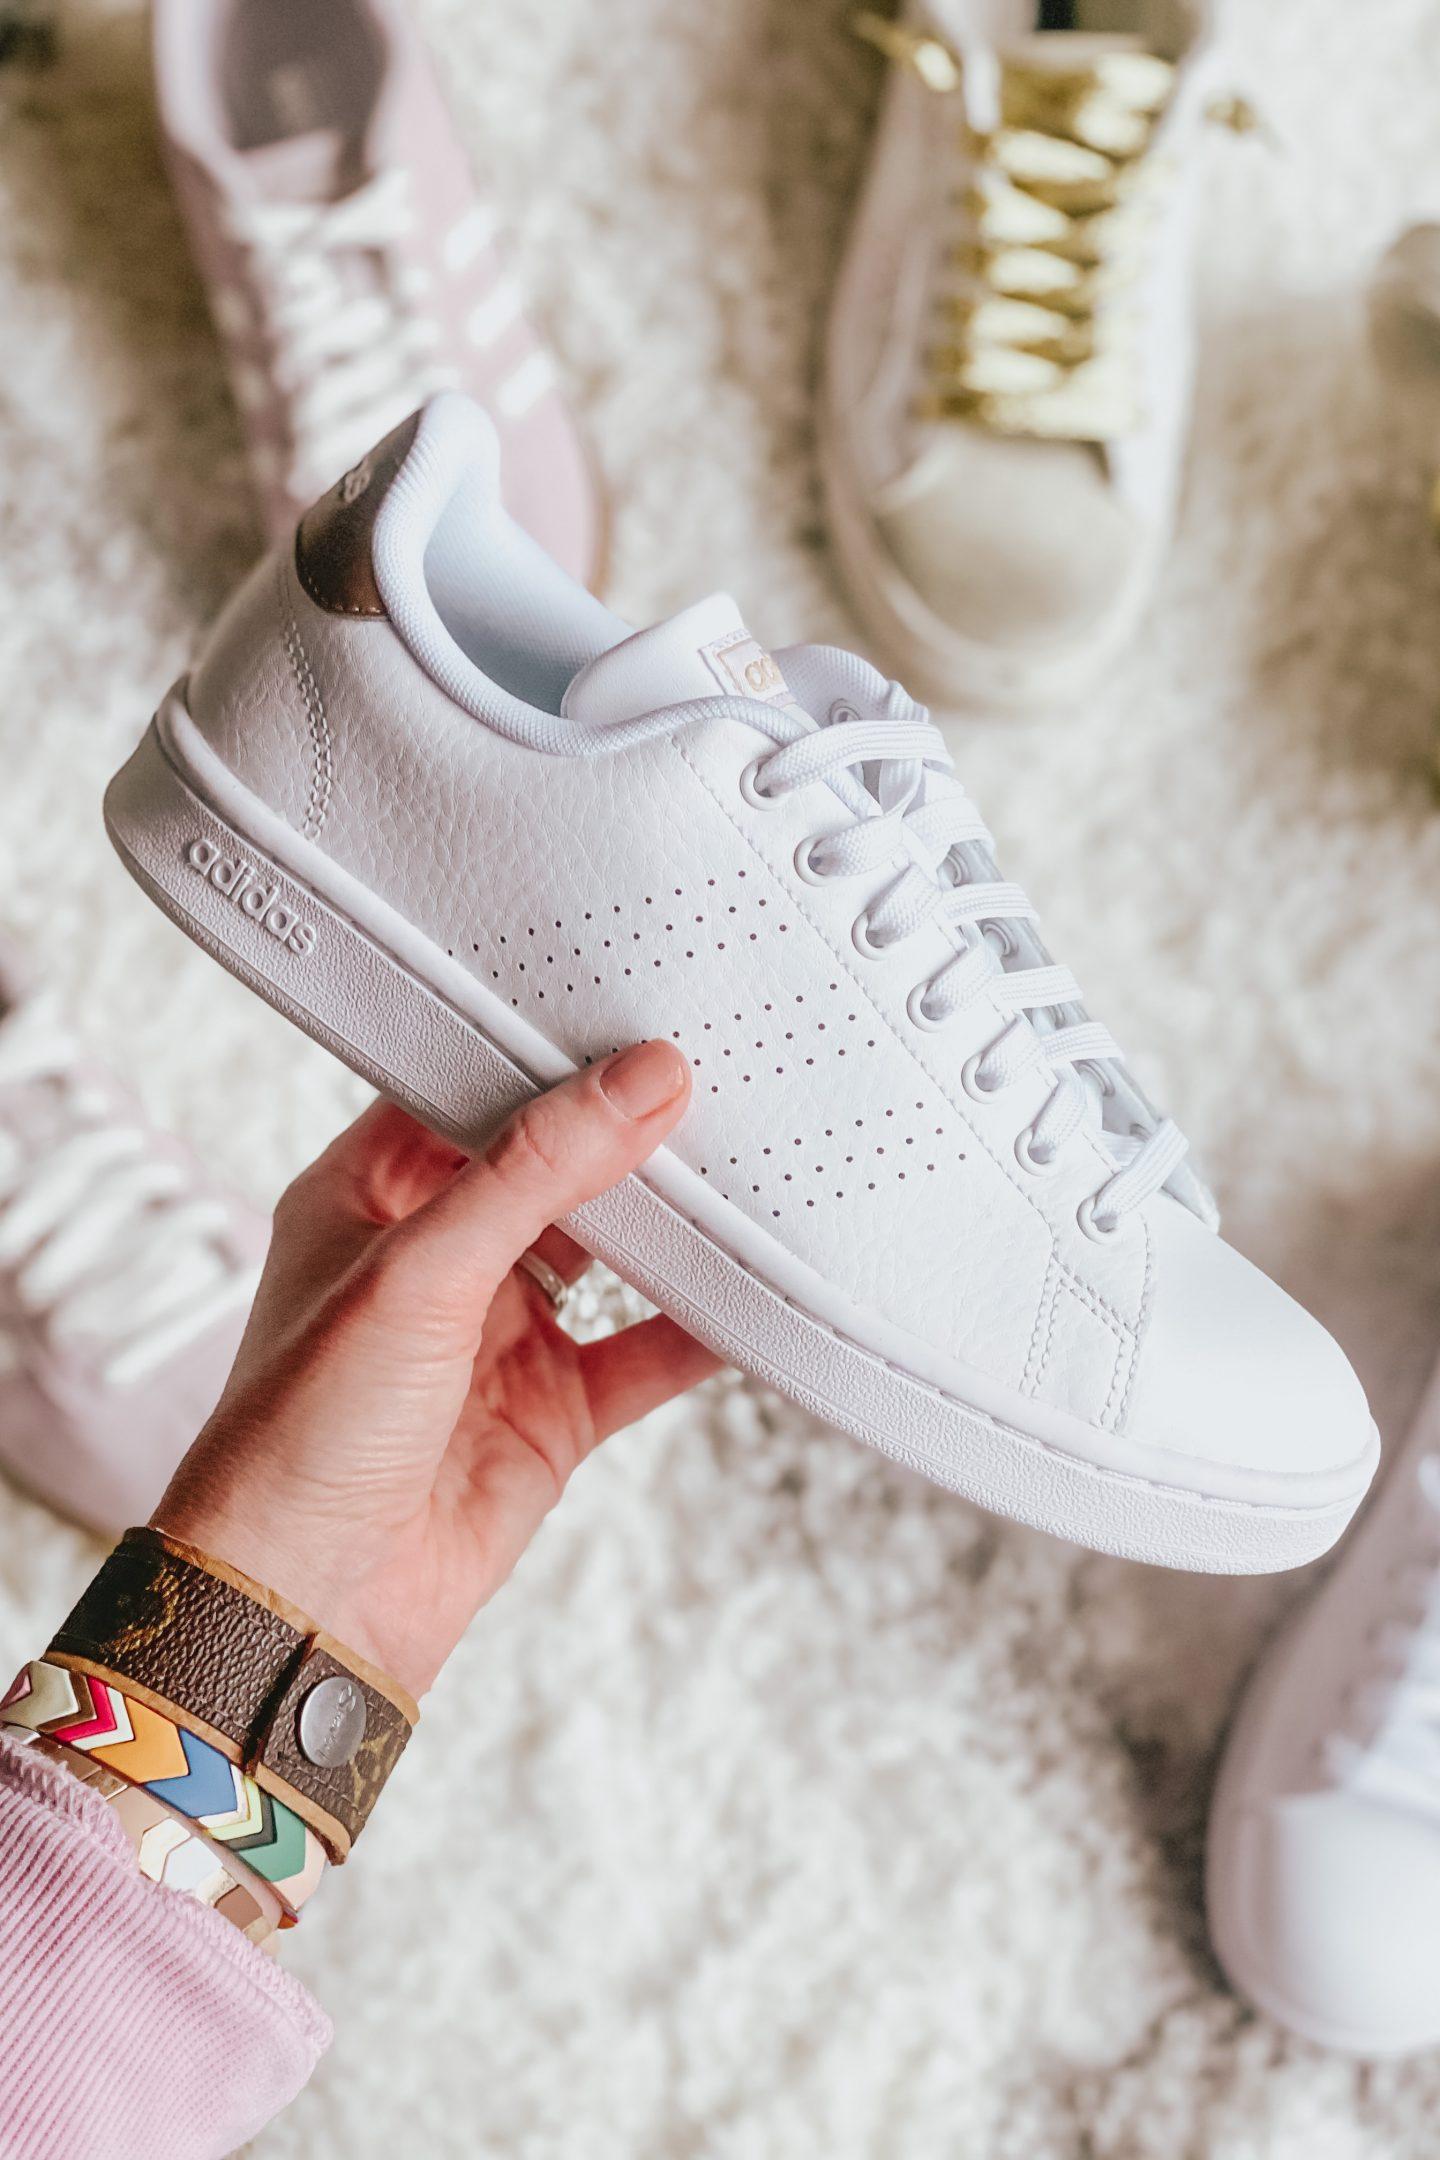 Adidas Advantage sneakers